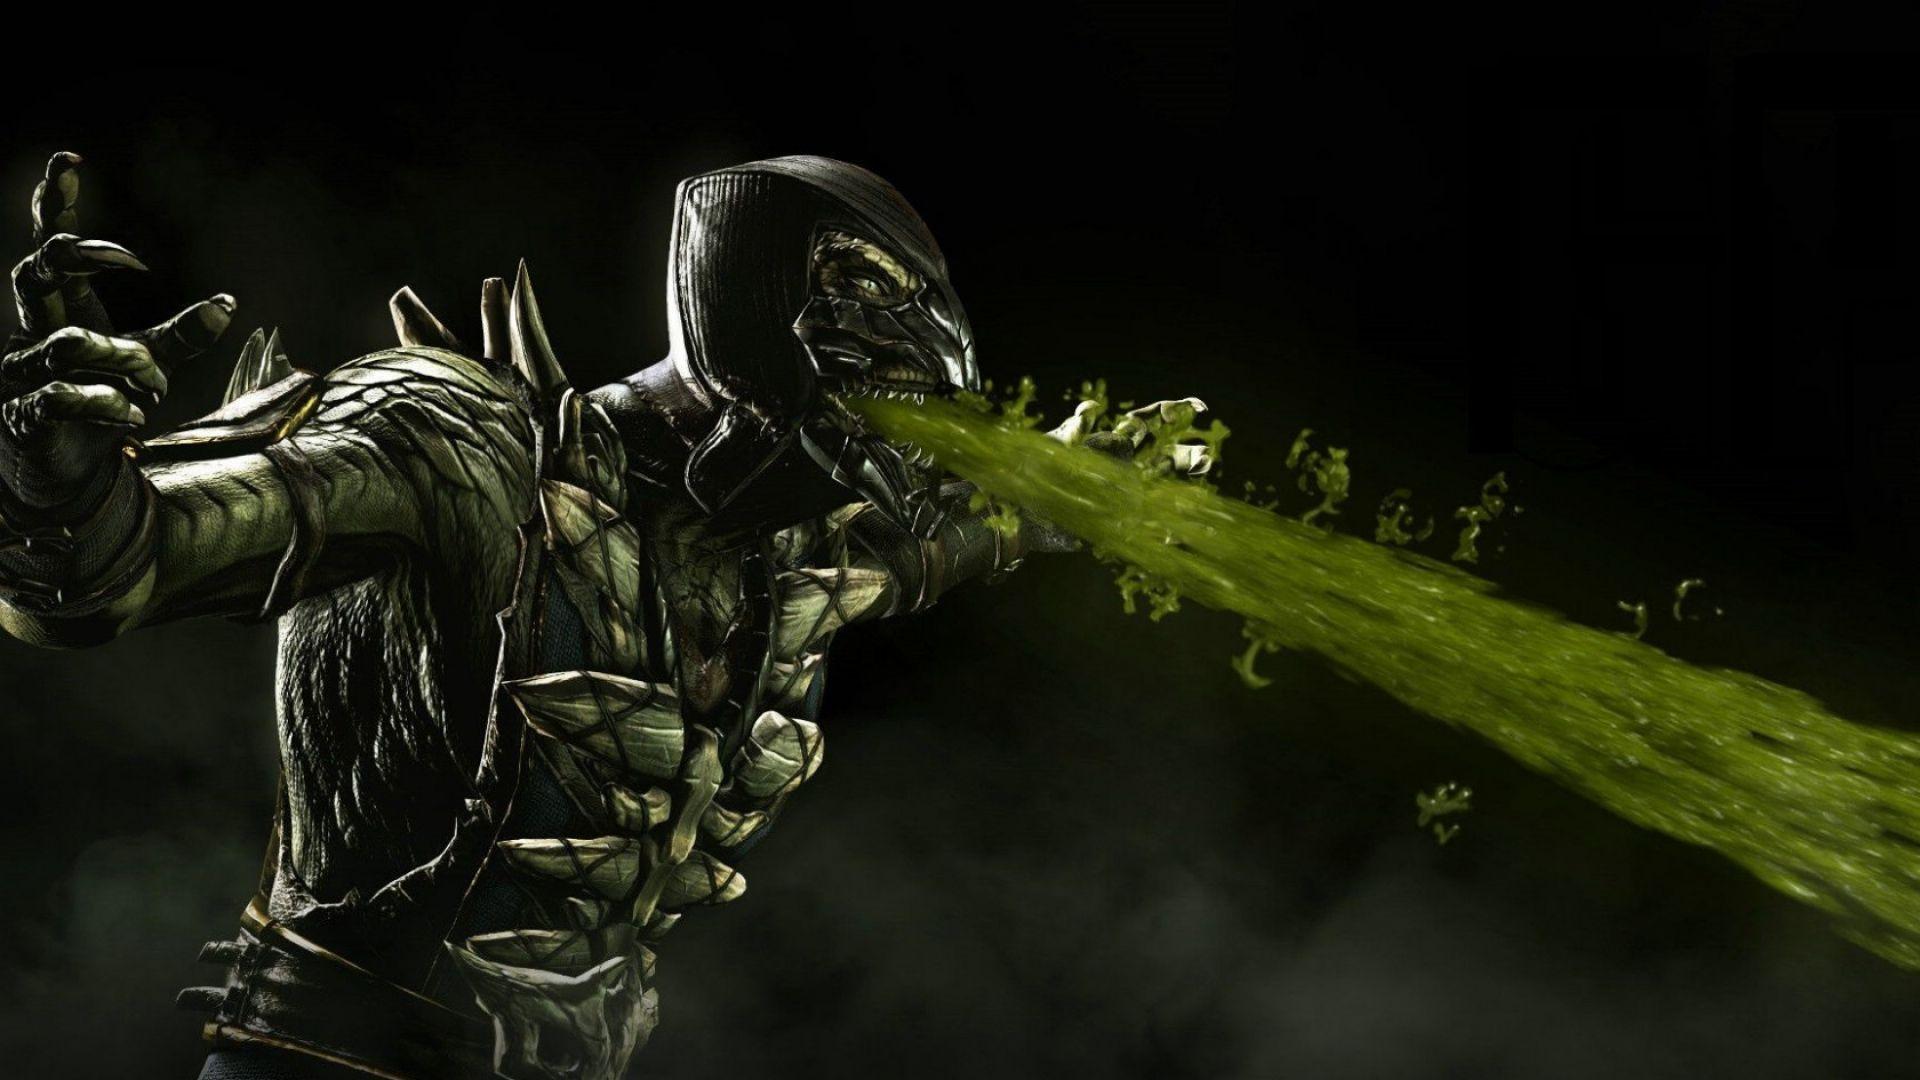 Mortal Kombat X Ermac Raiden Fight Magic Arena HD Wallpaper